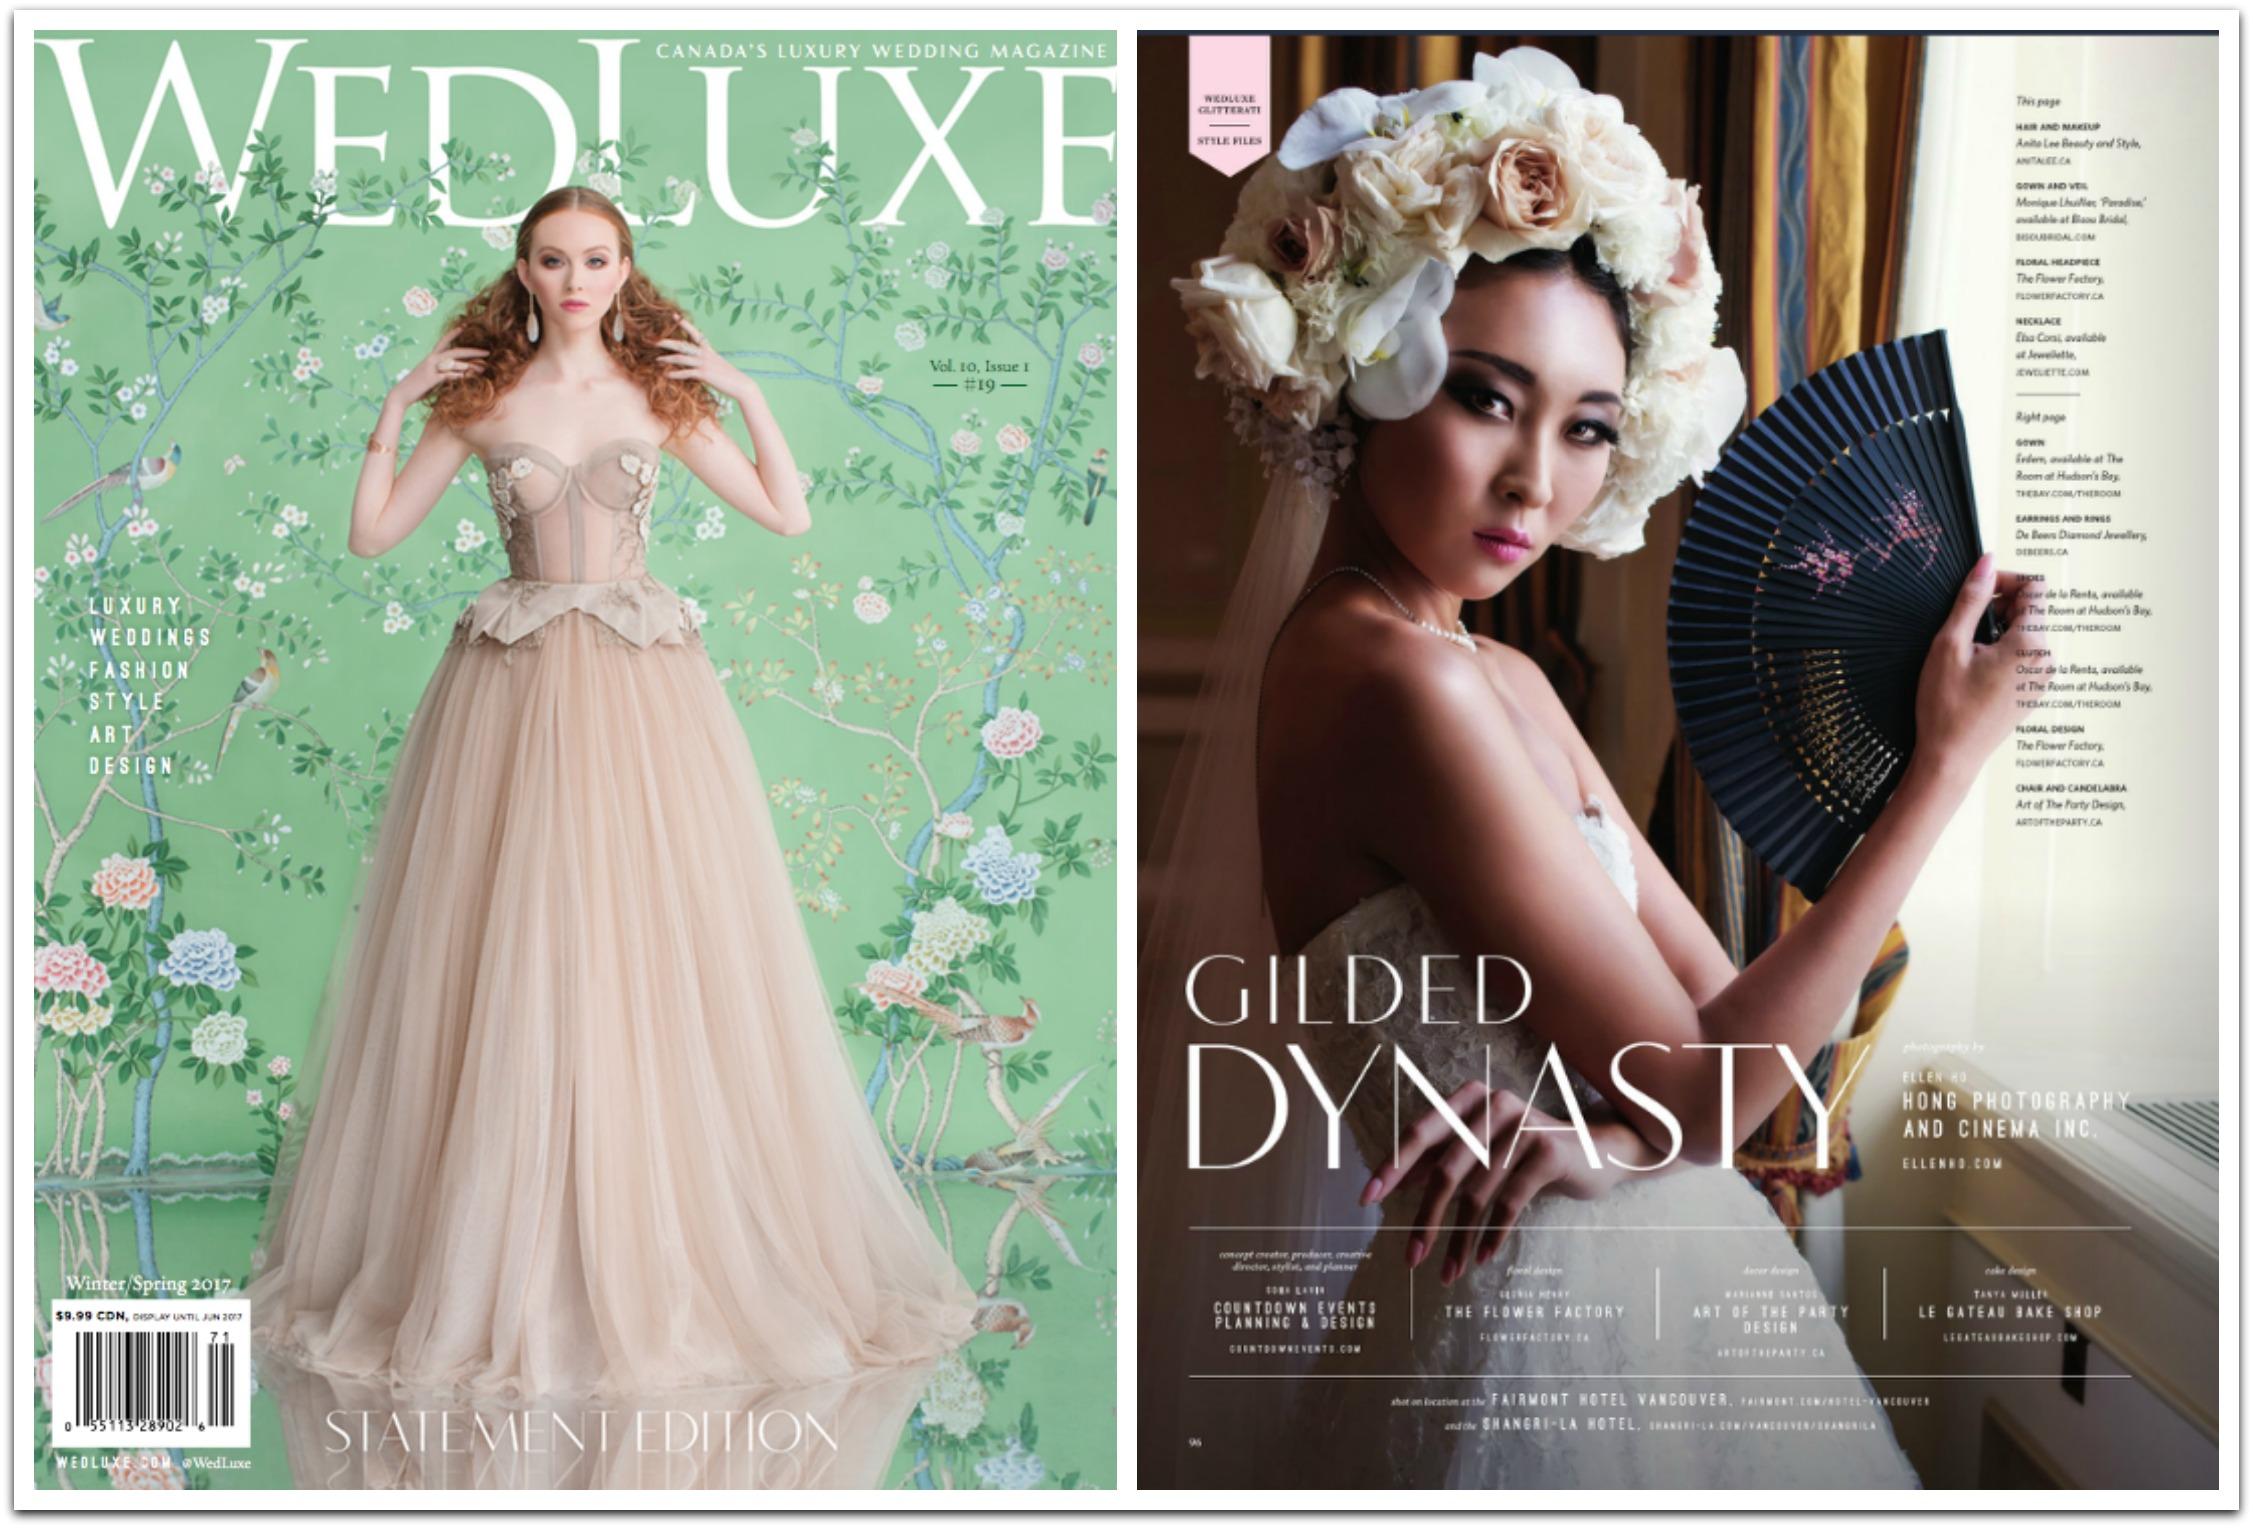 Wedluxe, Gilded Dynasty, Wedding Inspiration